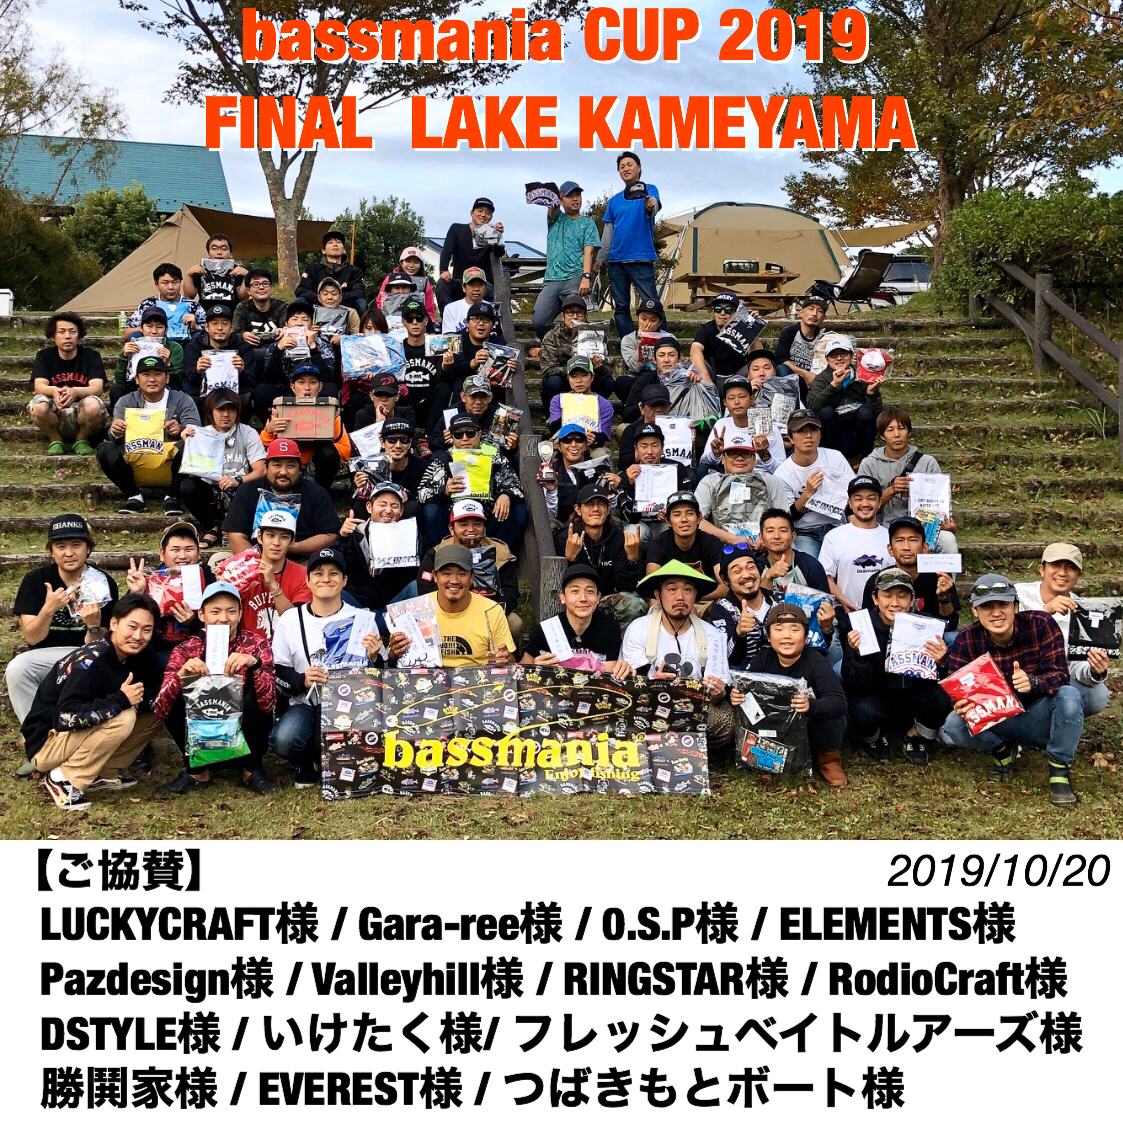 bassmania CUP FINAL 【TOP20 & ユニバーサル 戦】【大会結果】